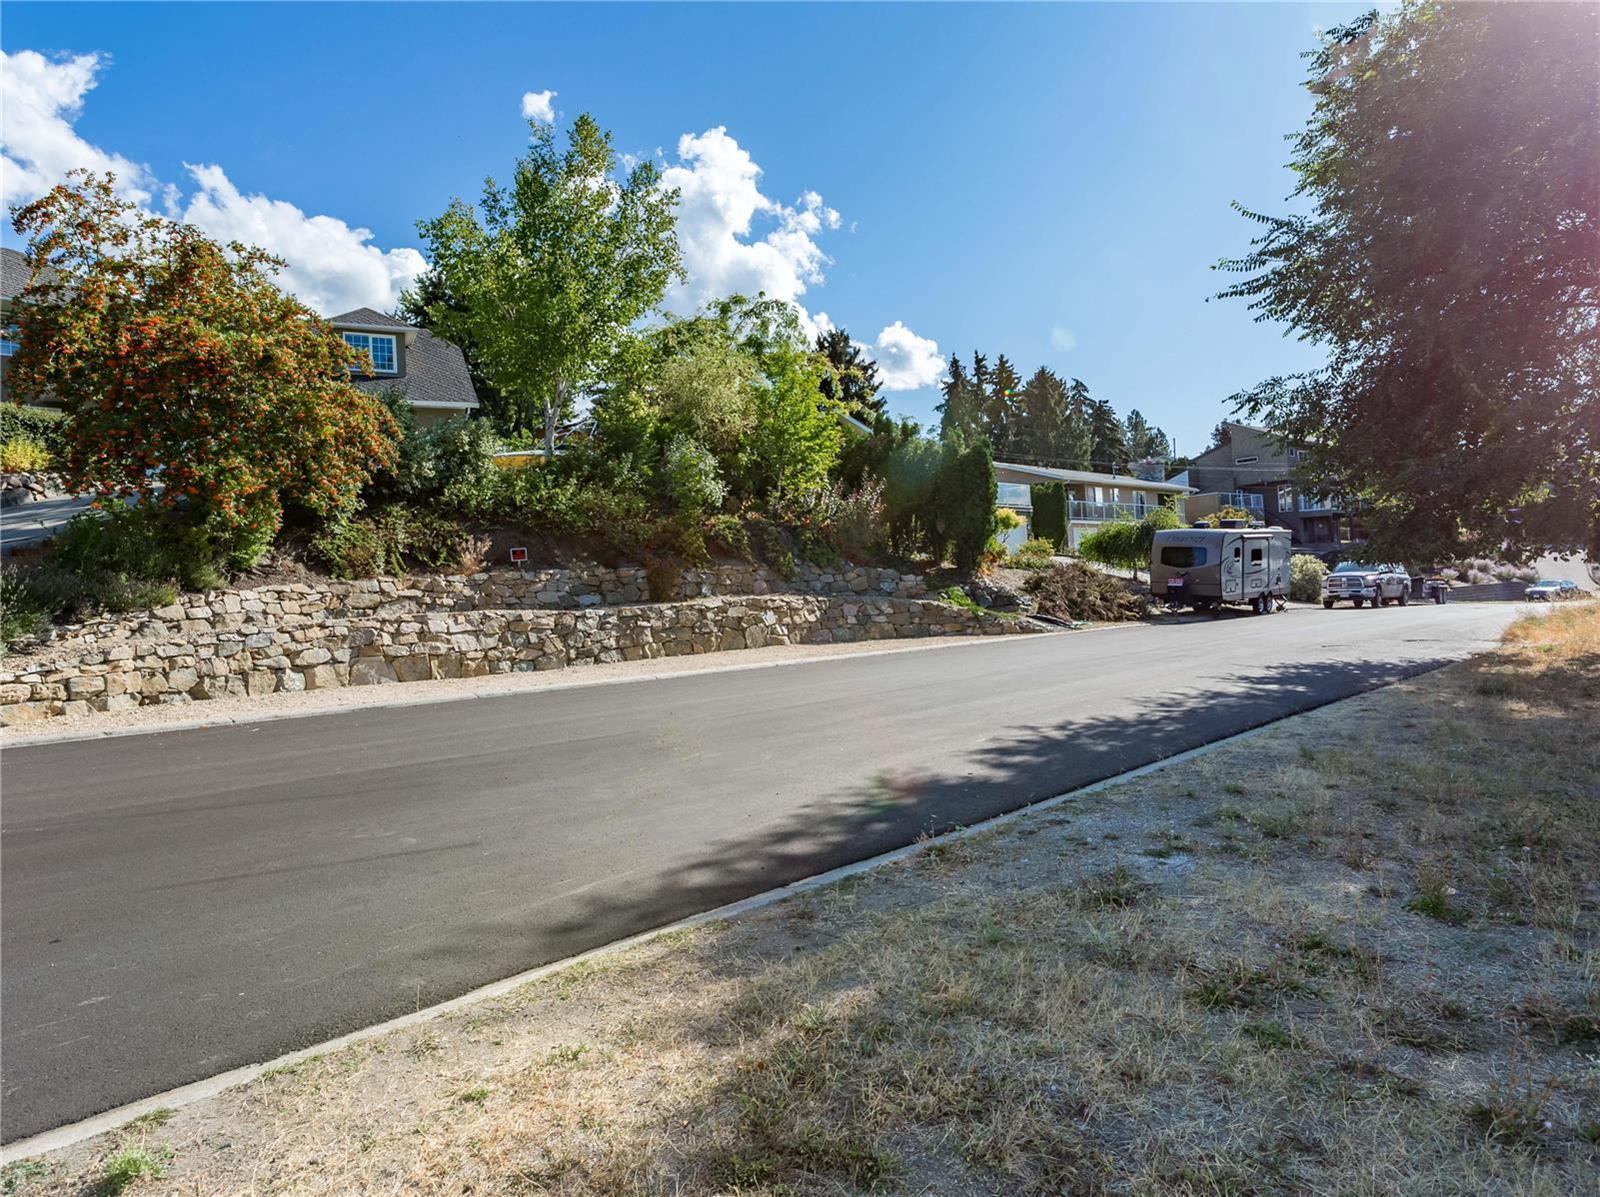 13940 Ponderosa Way,, Coldstream, British Columbia  V1B 1A4 - Photo 14 - 10216769